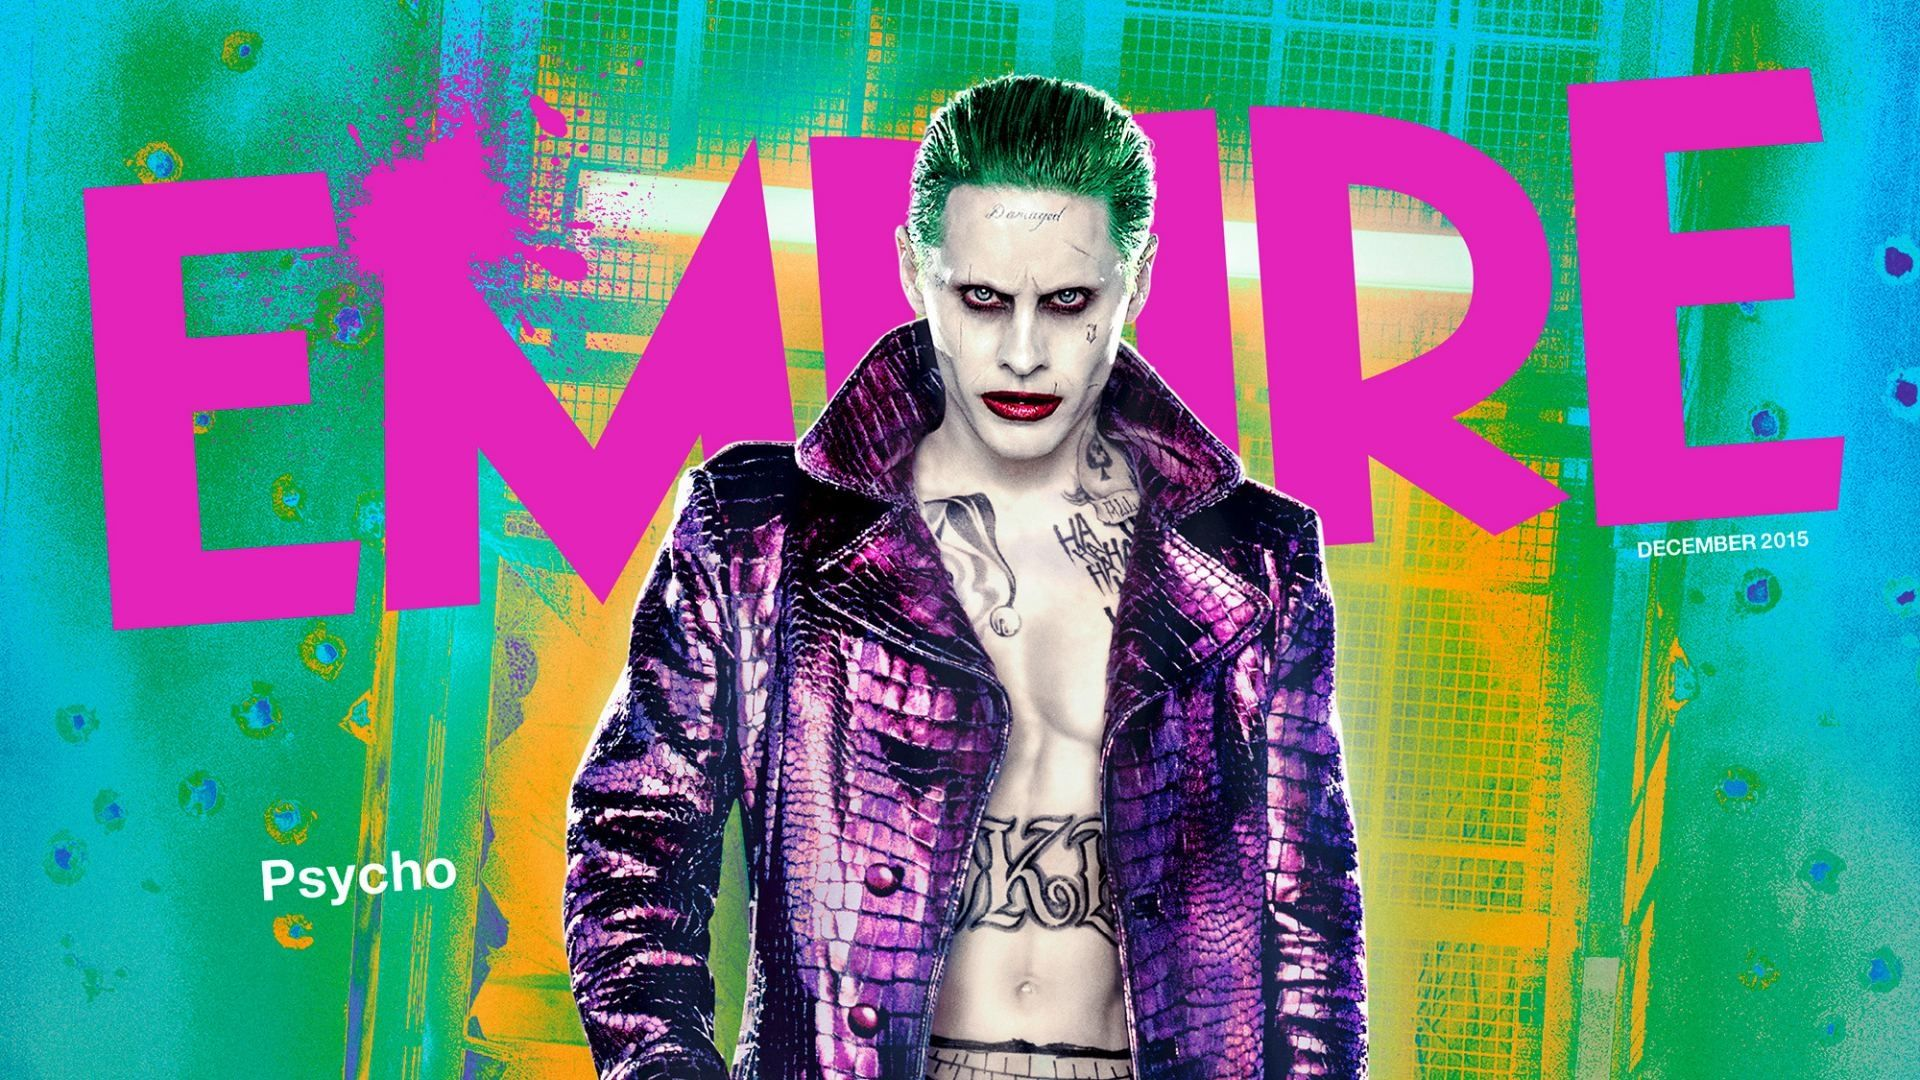 Suicide Squad, Joker Wallpaper Image